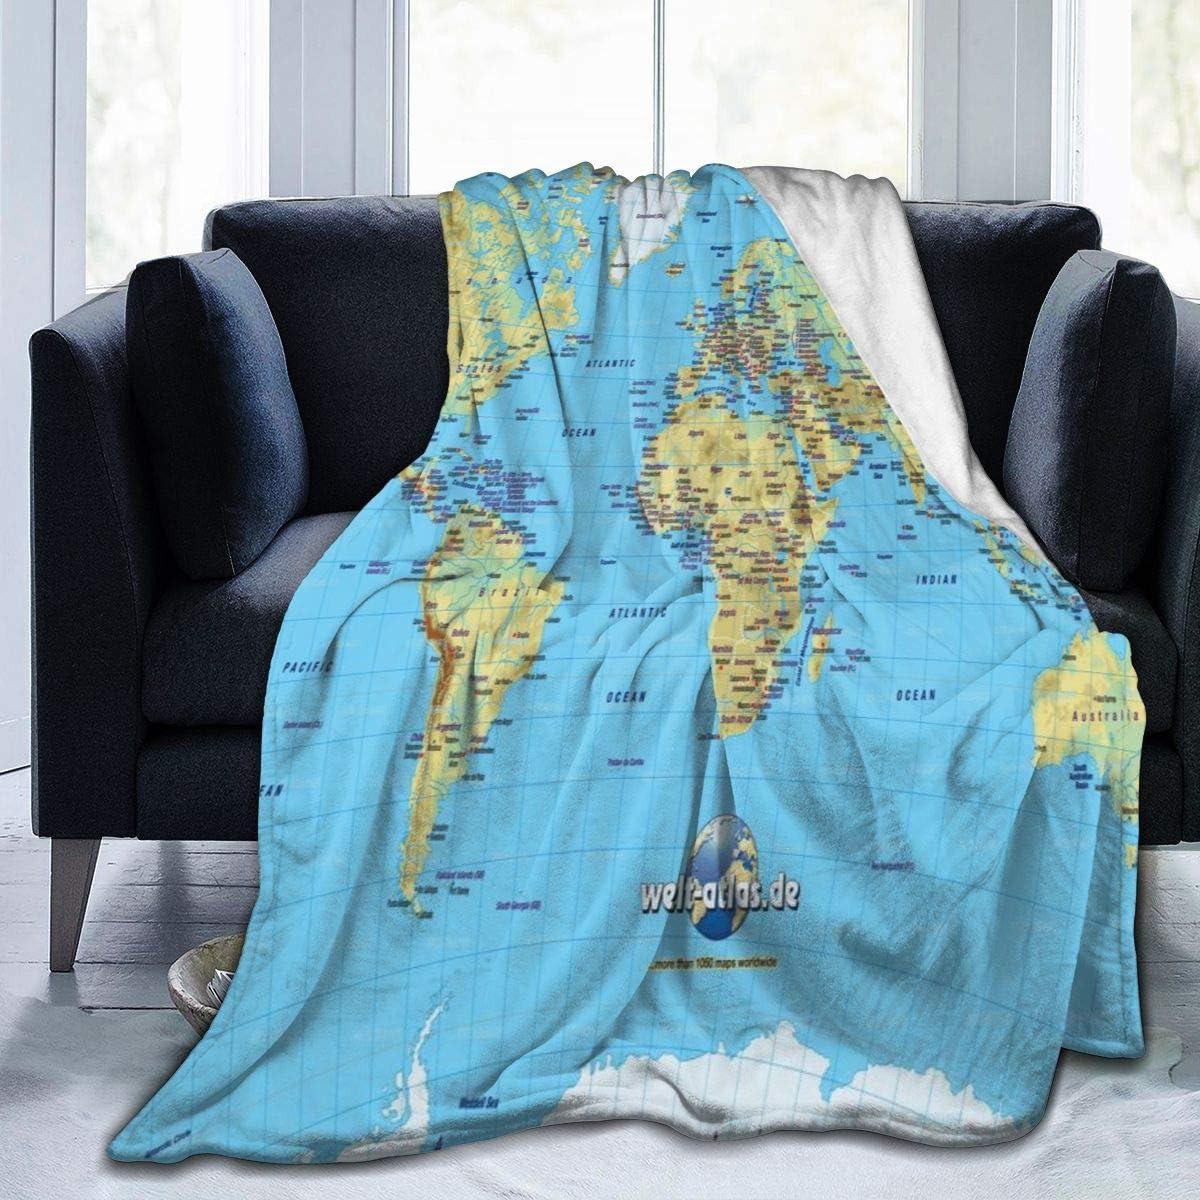 CLQQP Throw Blanket Best World Fleece Map 送料無料新品 Bab ◆セール特価品◆ Super Soft